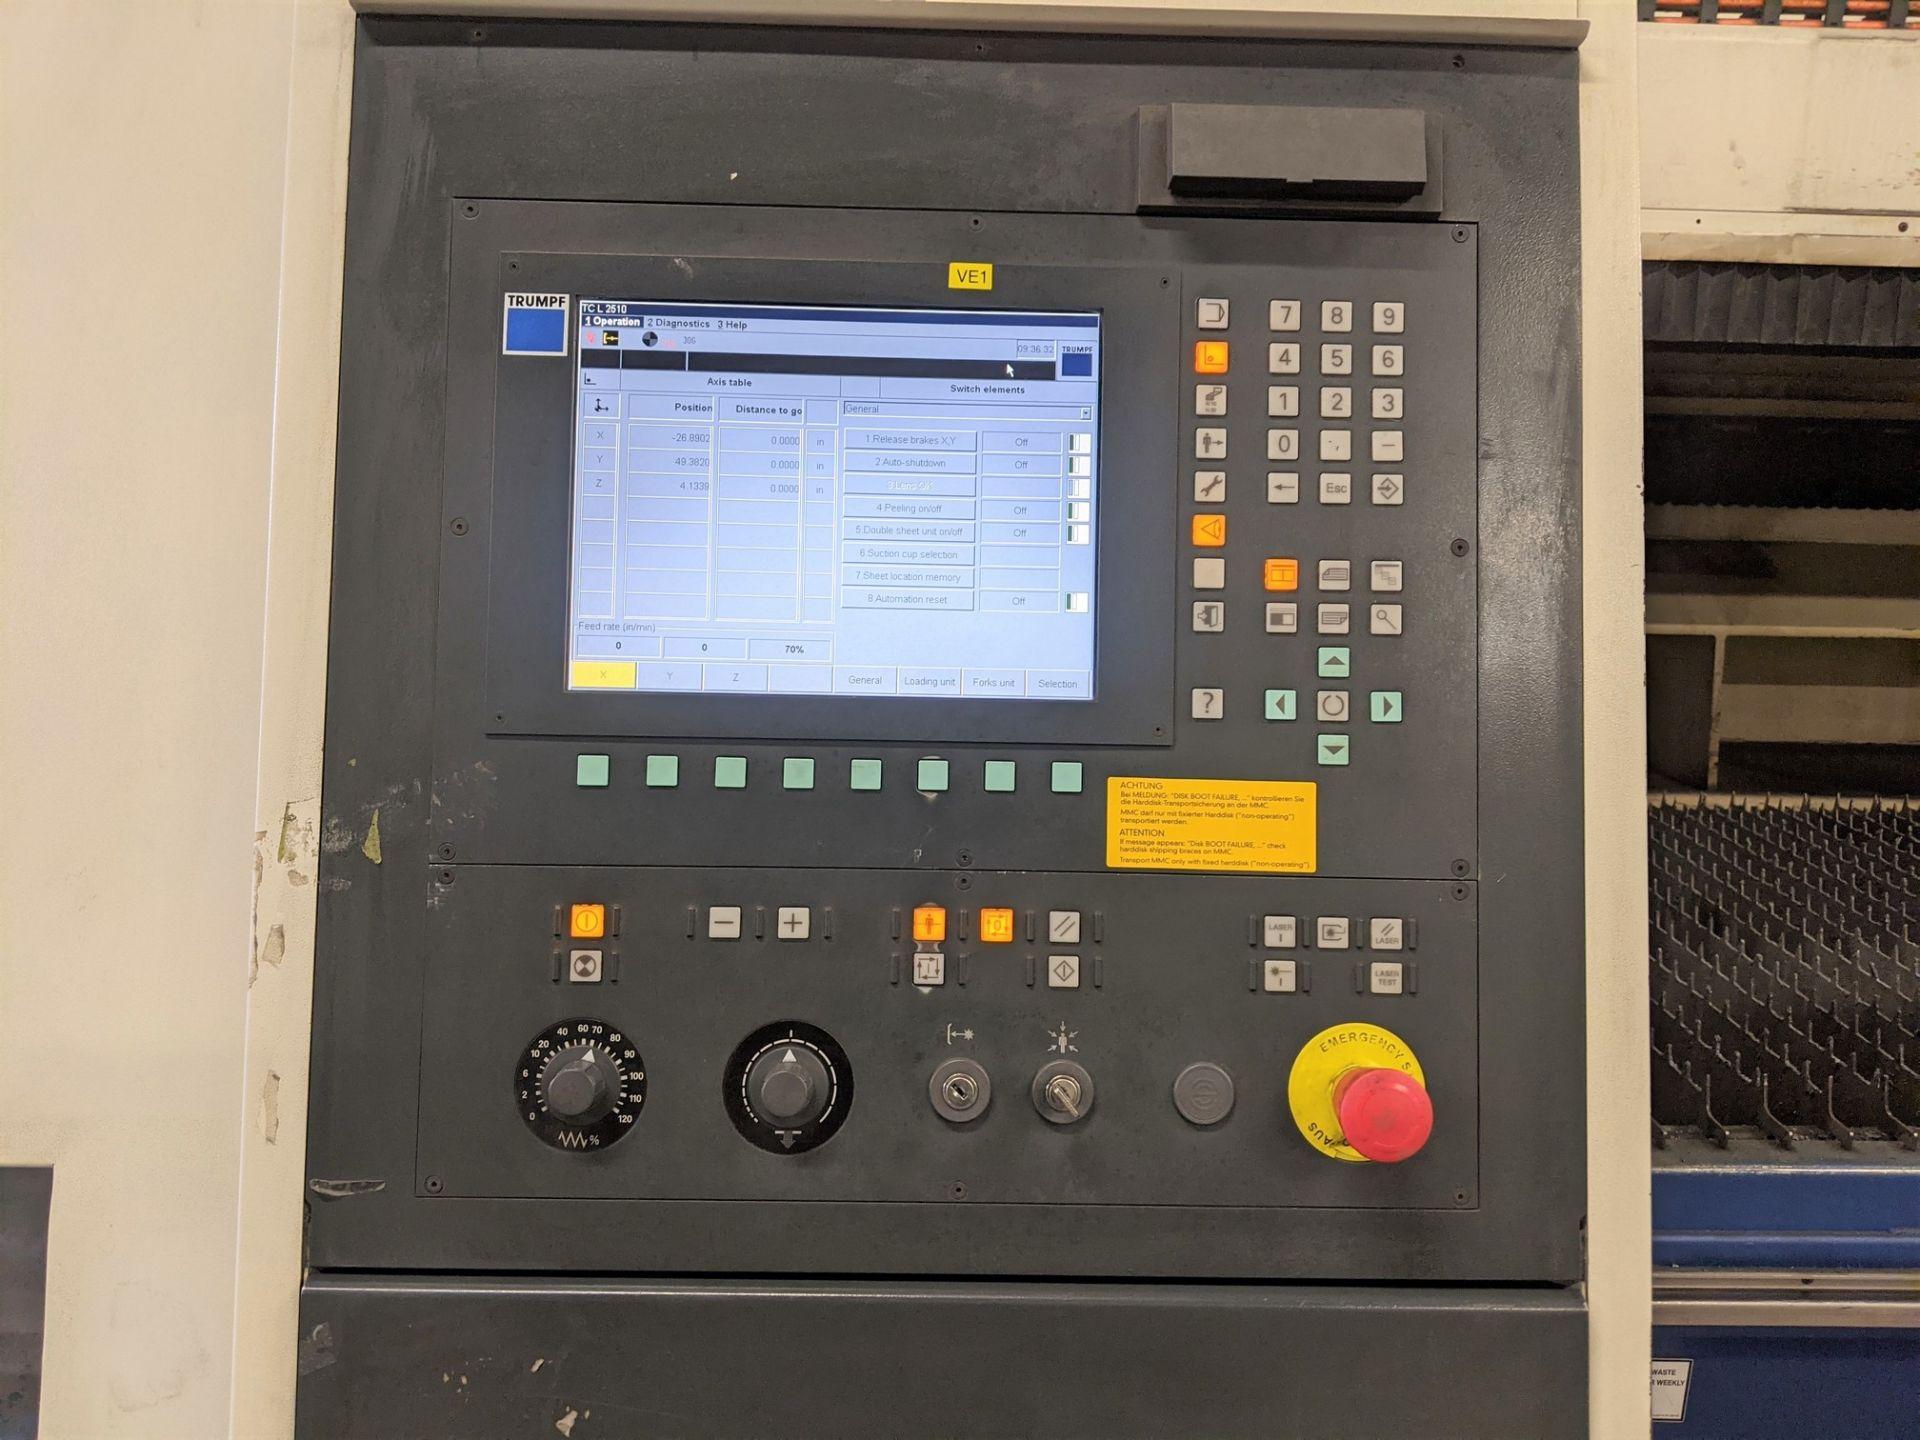 "2006 TRUMPF TRUMATIC L 2510 CNC LASER, 2,000 WATT, 4' X 10' TABLE, TRAVELS: X-120"", Y-50"", Z- - Image 9 of 32"